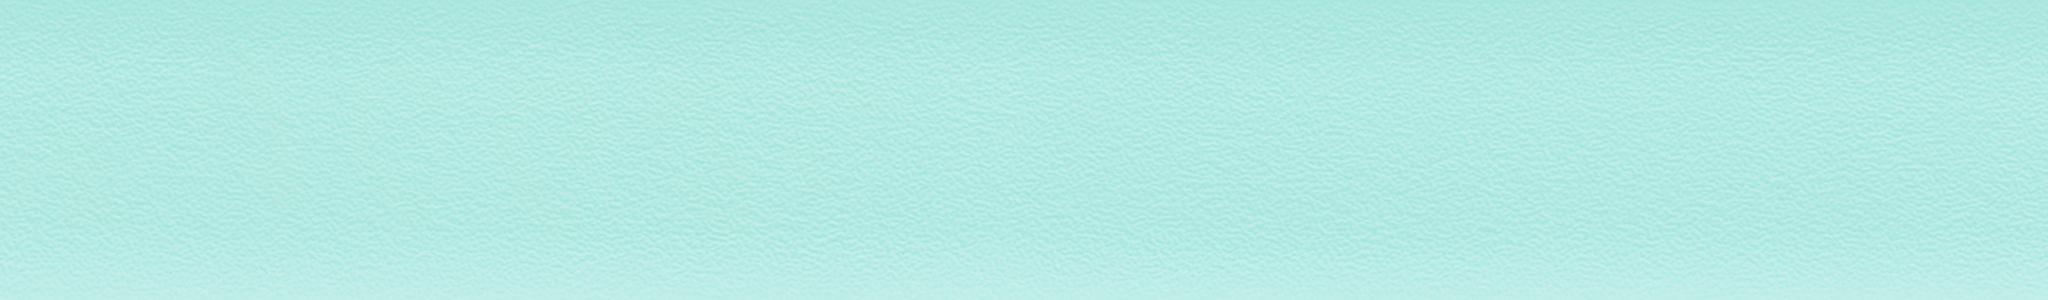 HU 16126 ABS hrana zelená perla 101